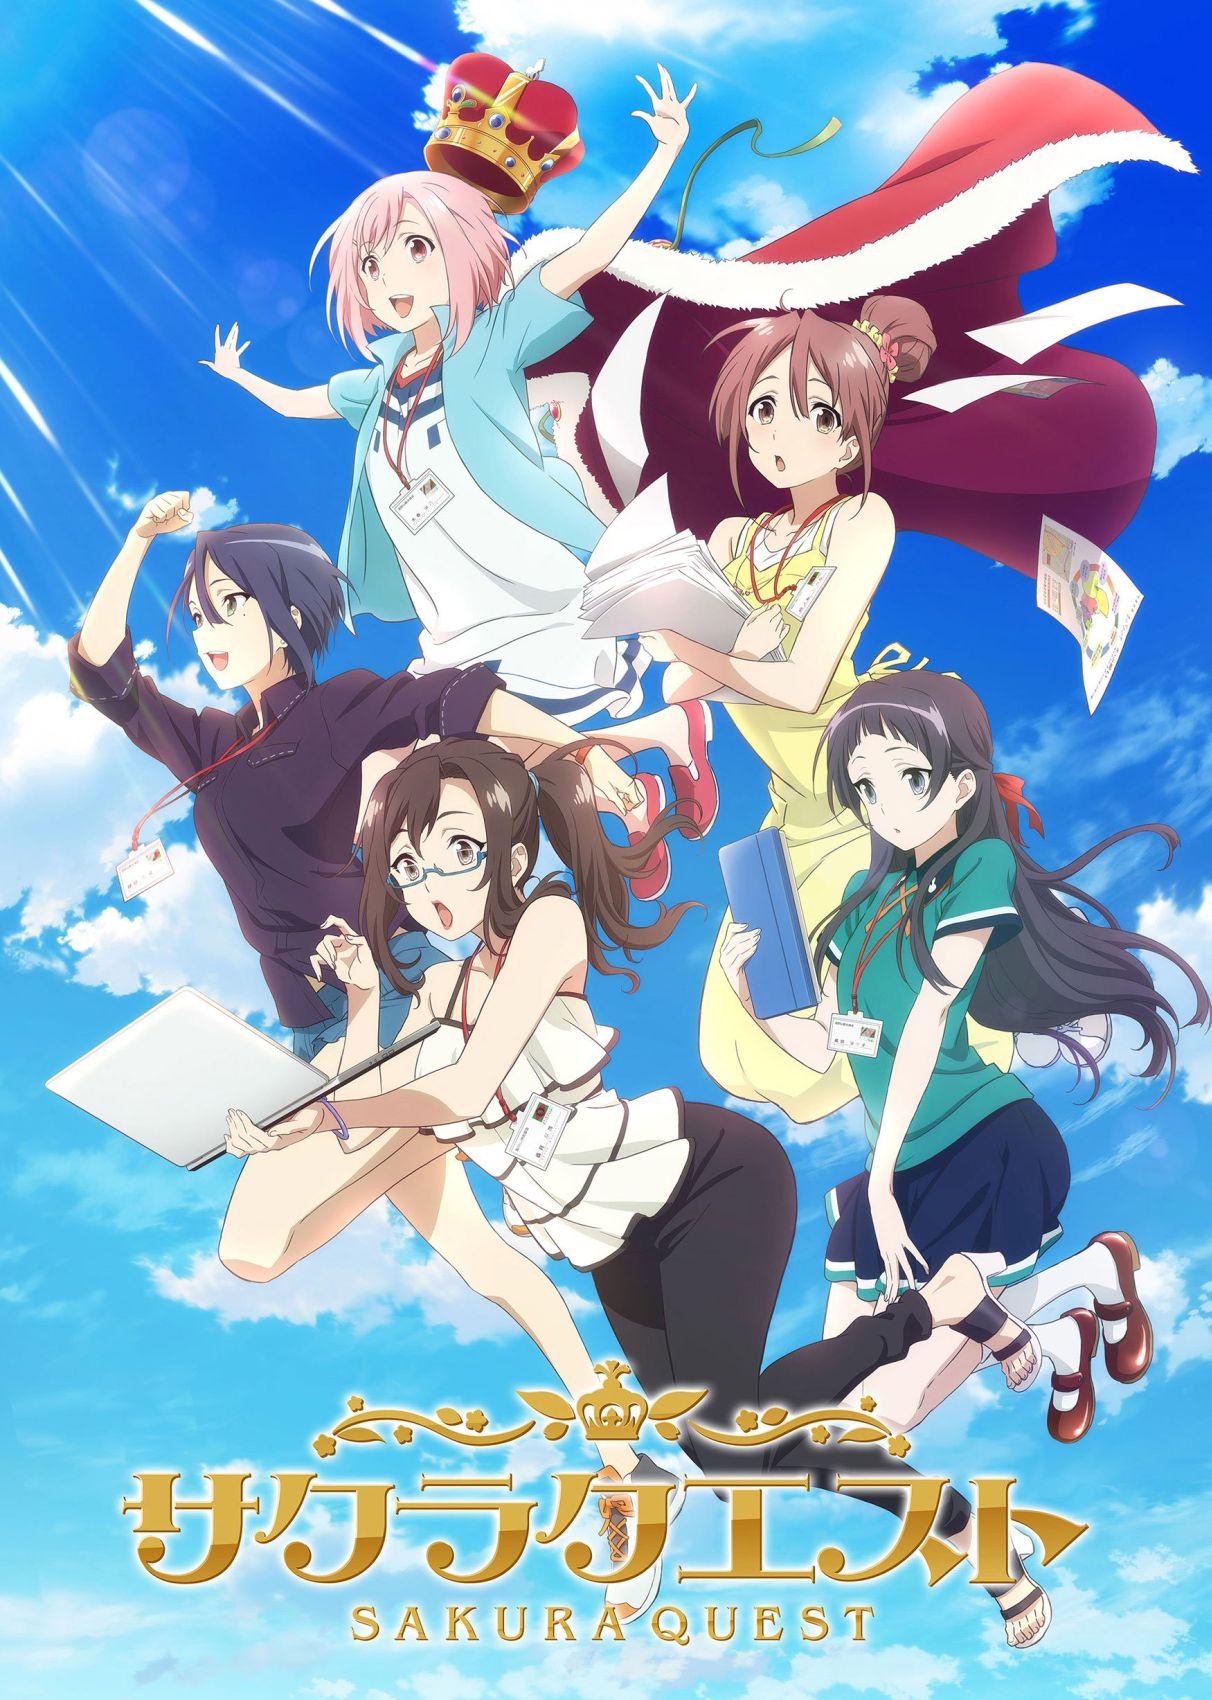 Sakura Quest - recenzja anime - rascal.pl